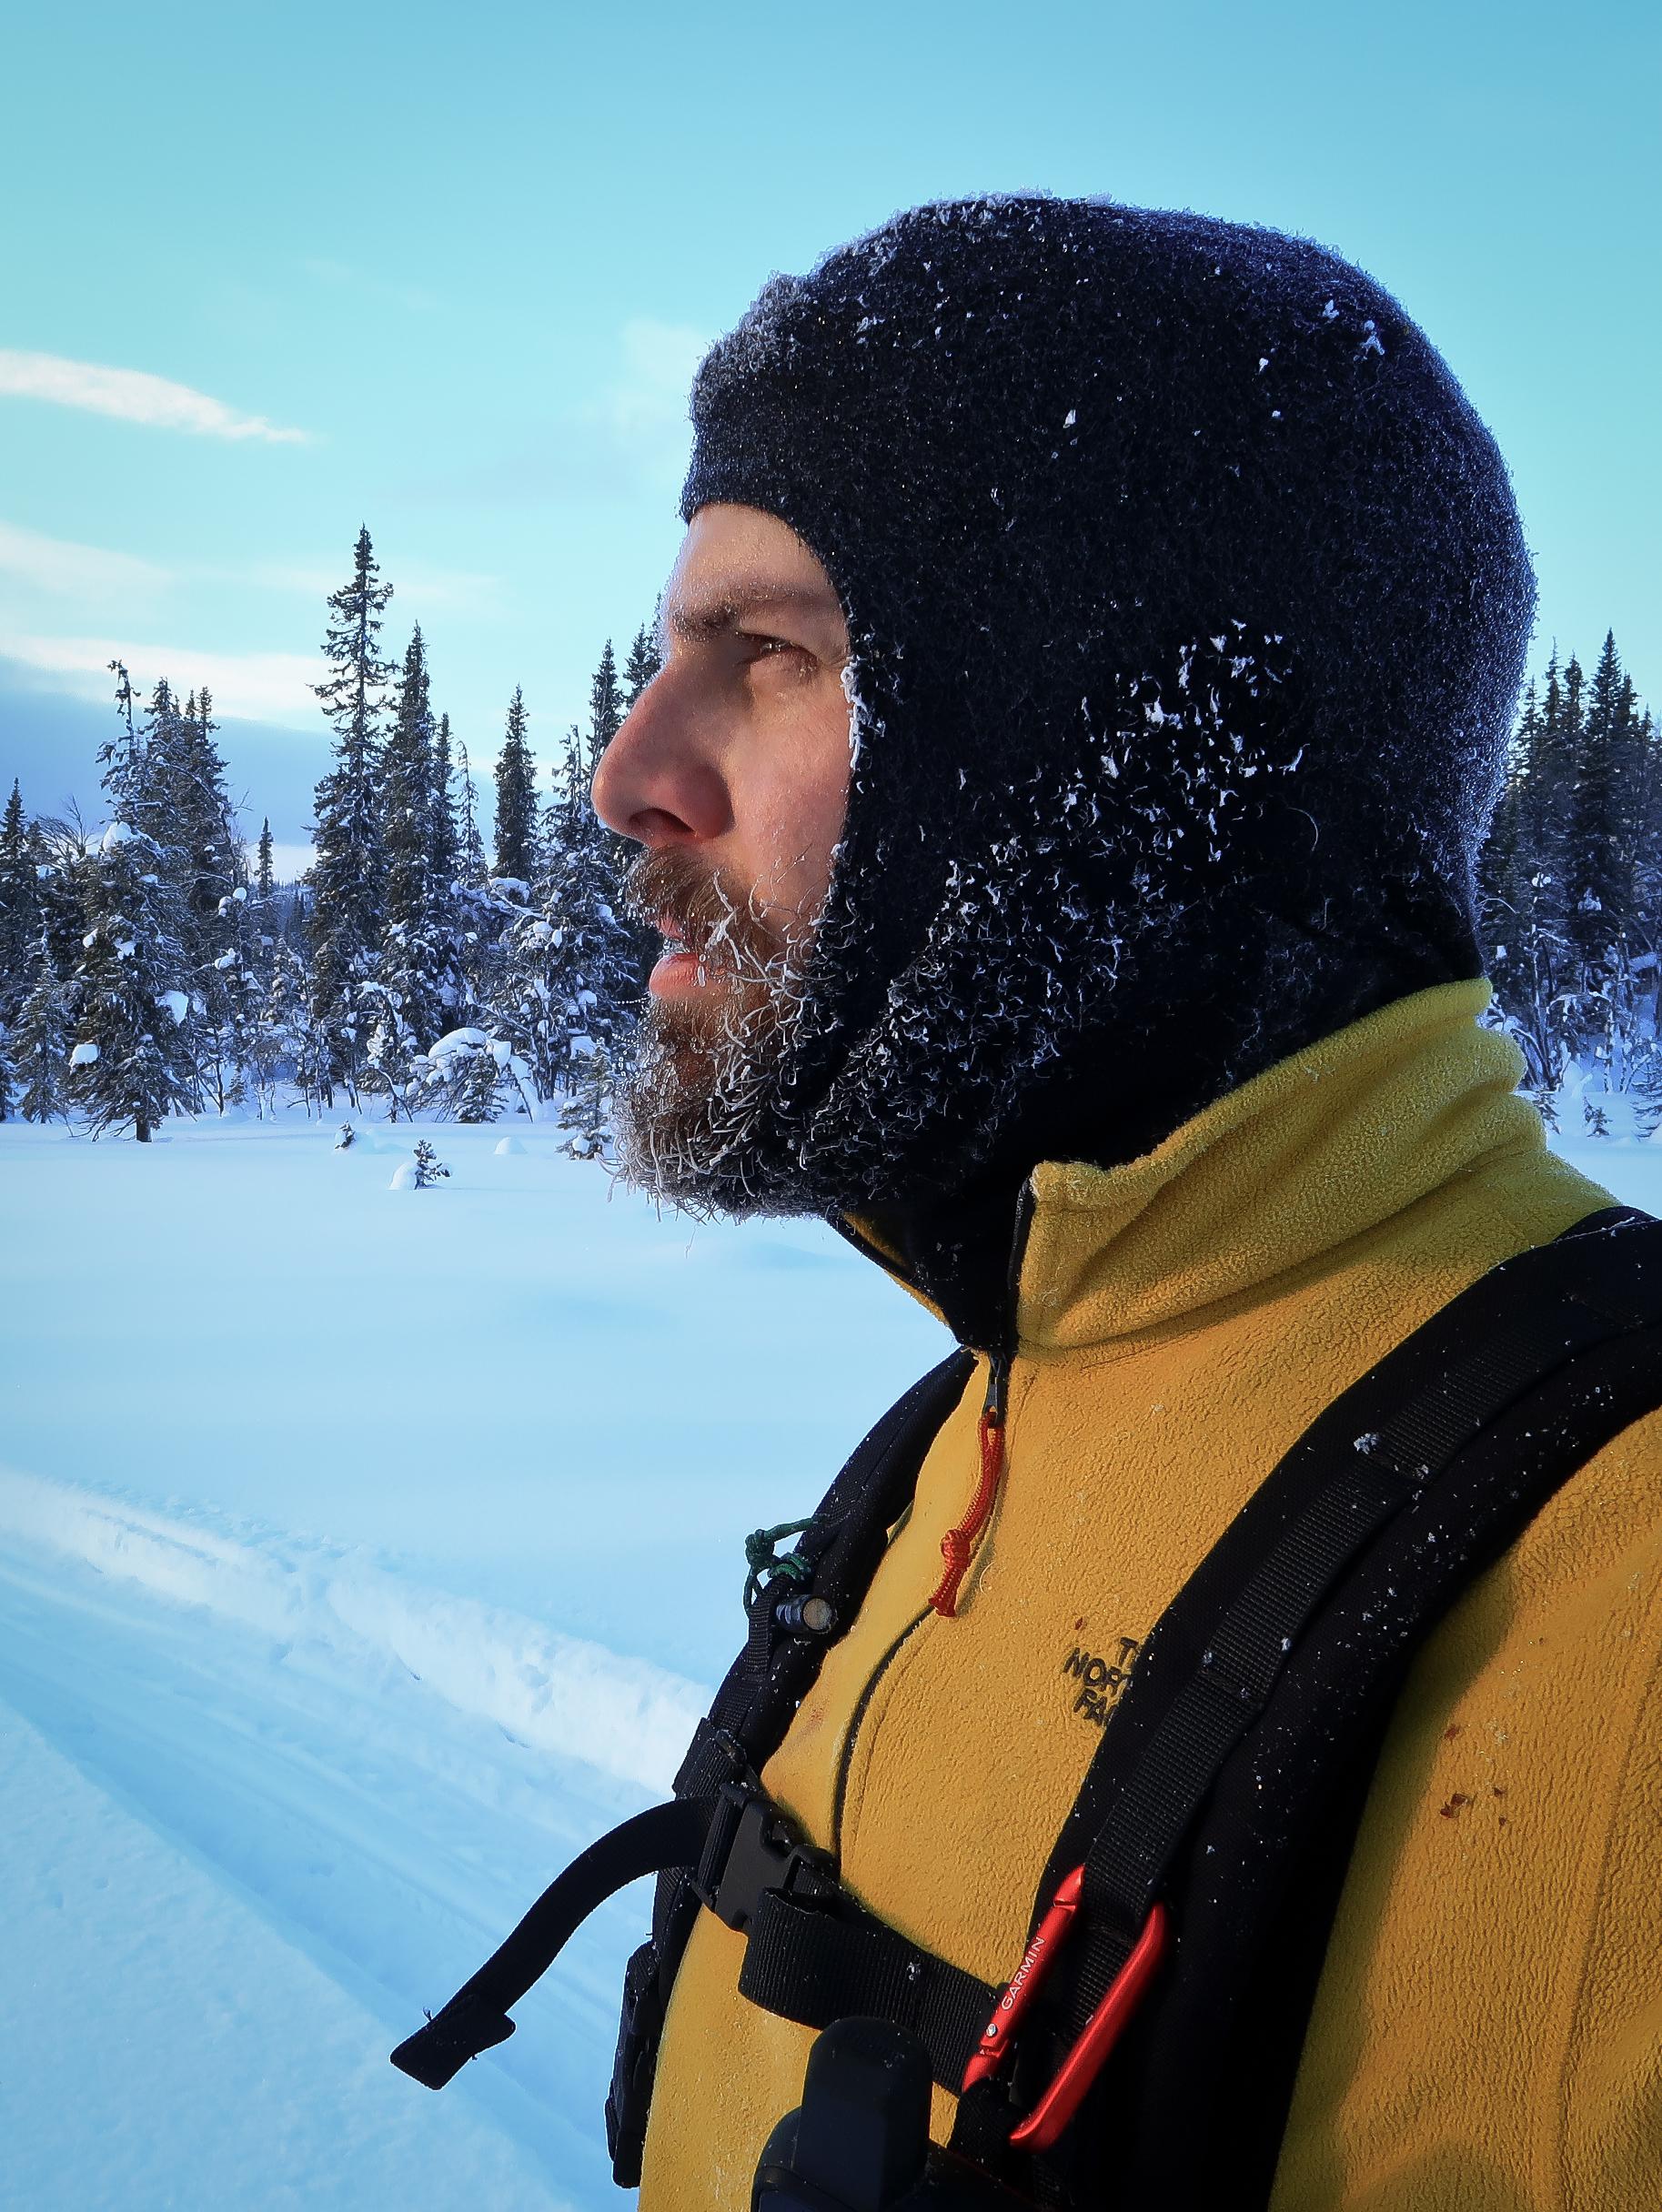 Checking progress while breaking trail through deep snow